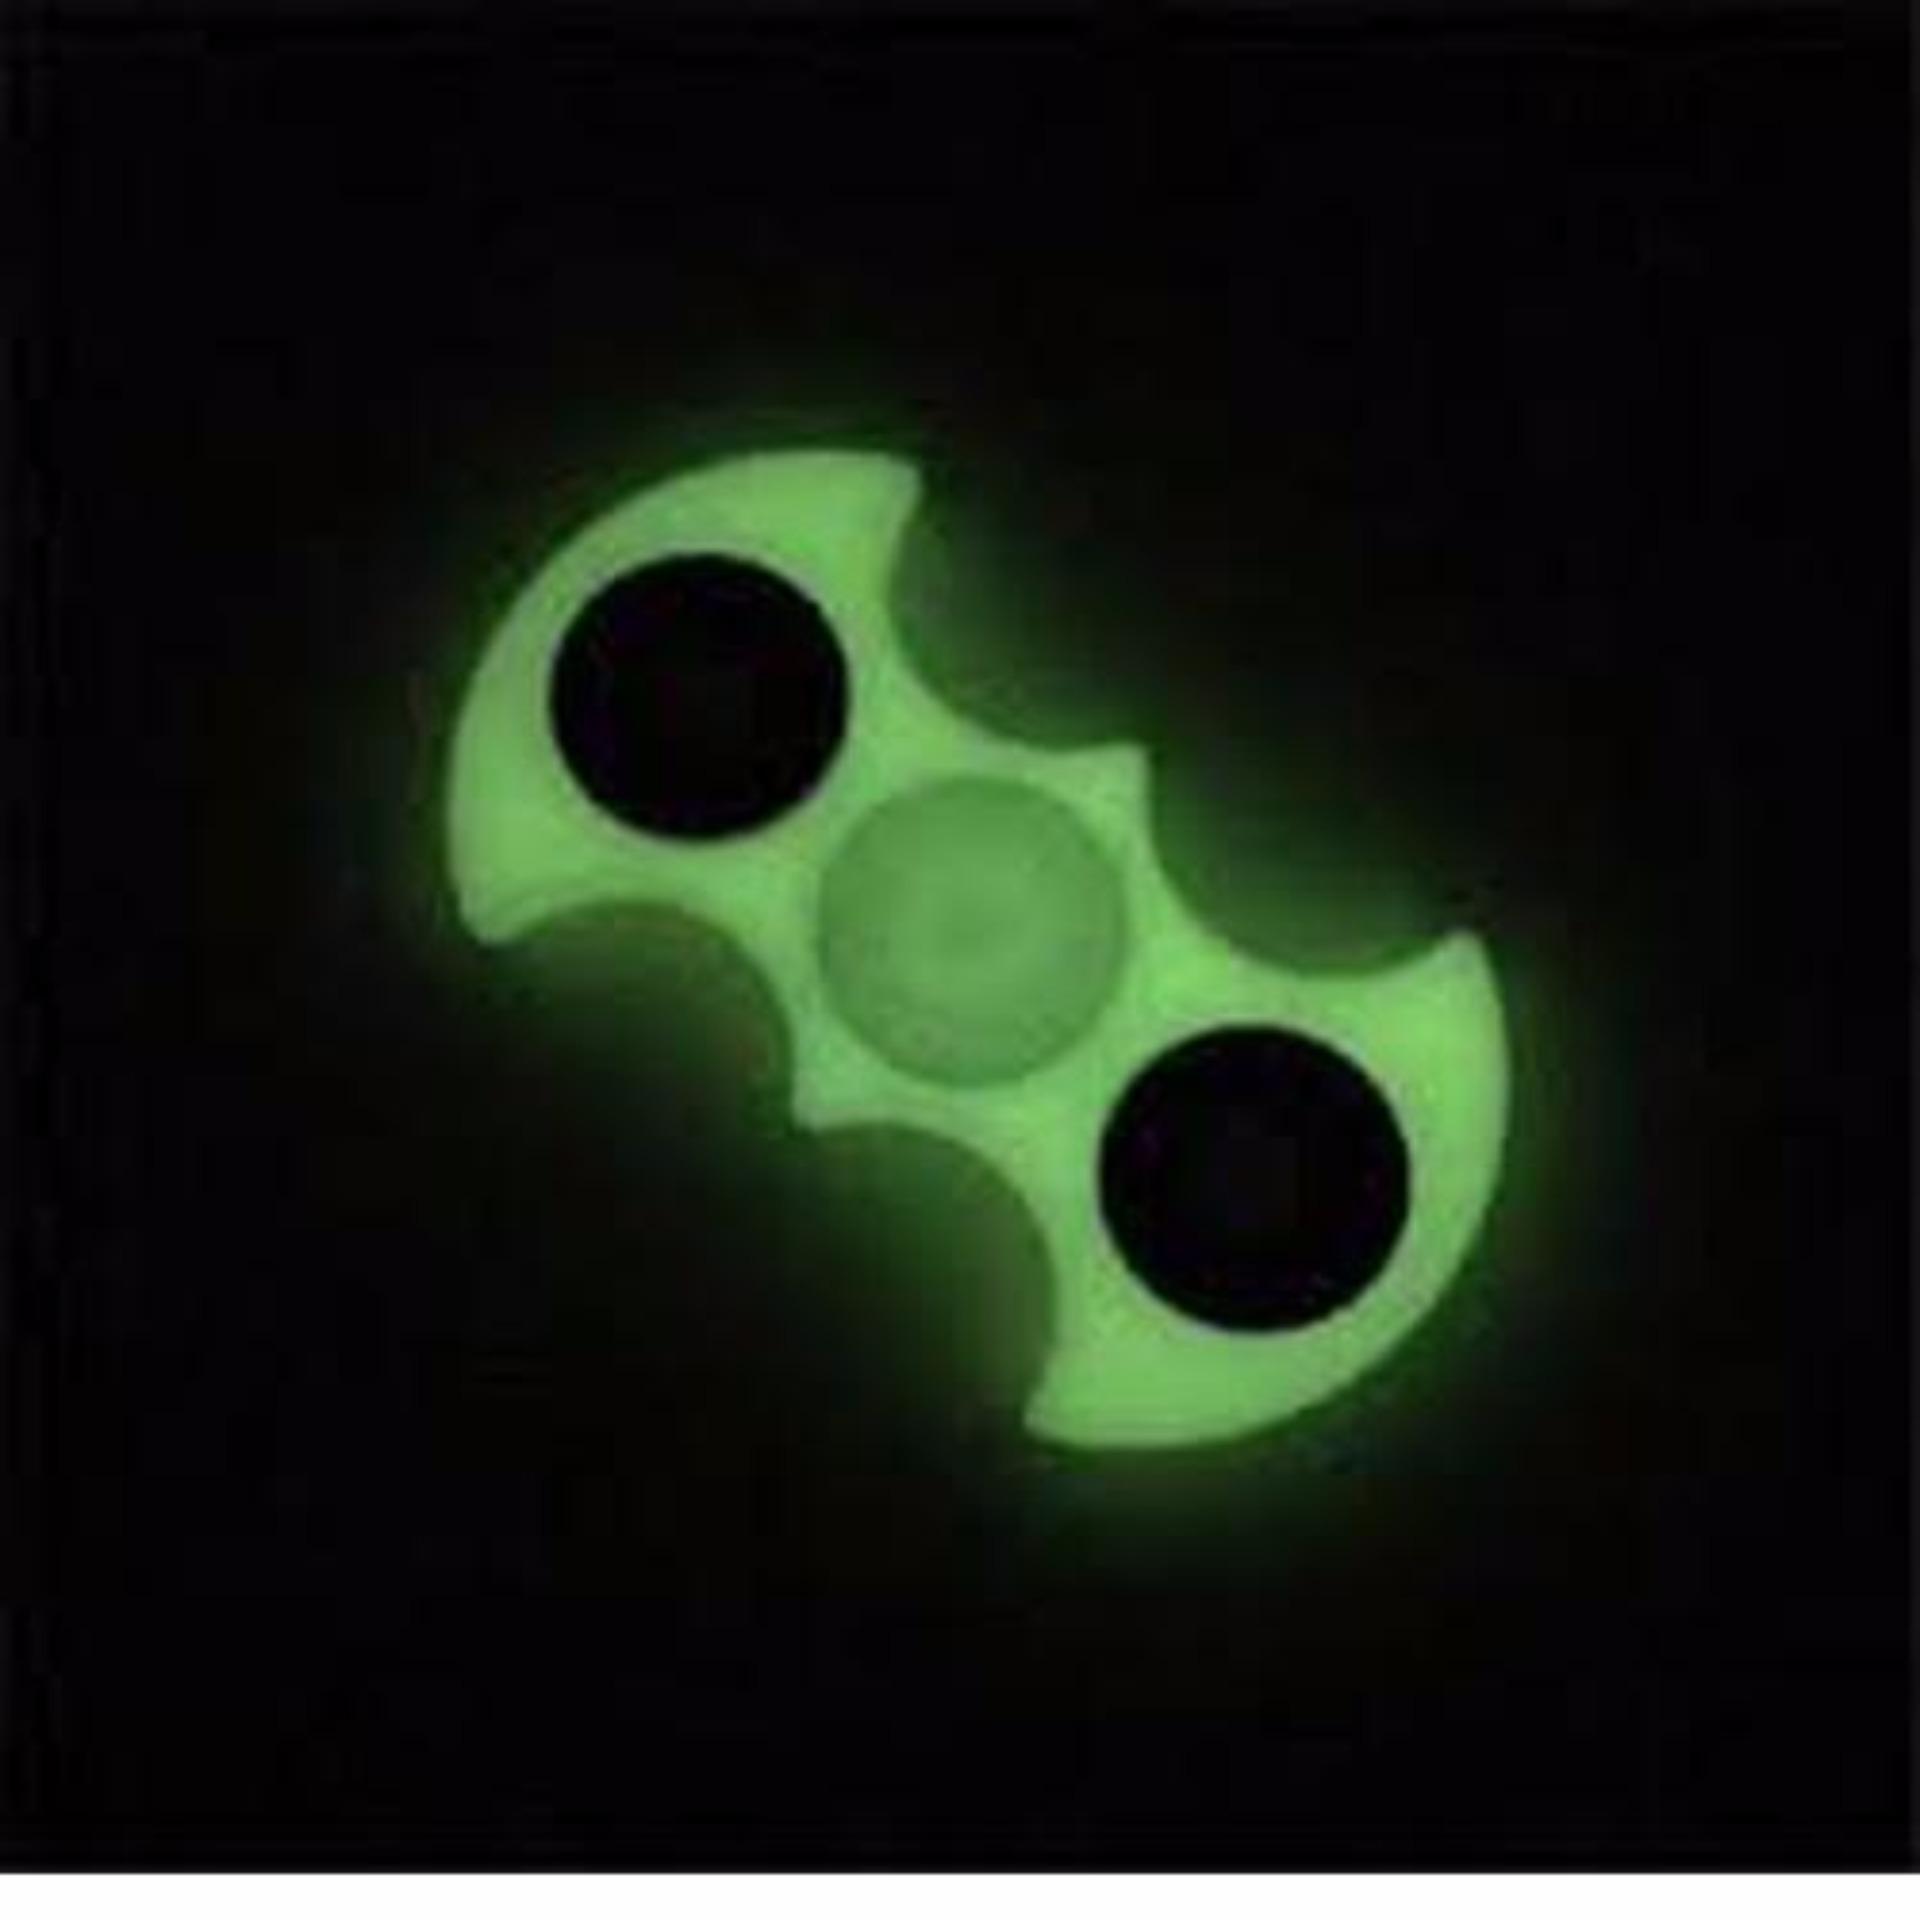 Harga Termurah Hoki Cod Spinner Bat Man Glow In The Dark Pelastik Segi Lima 3 Bola Besi Toys White